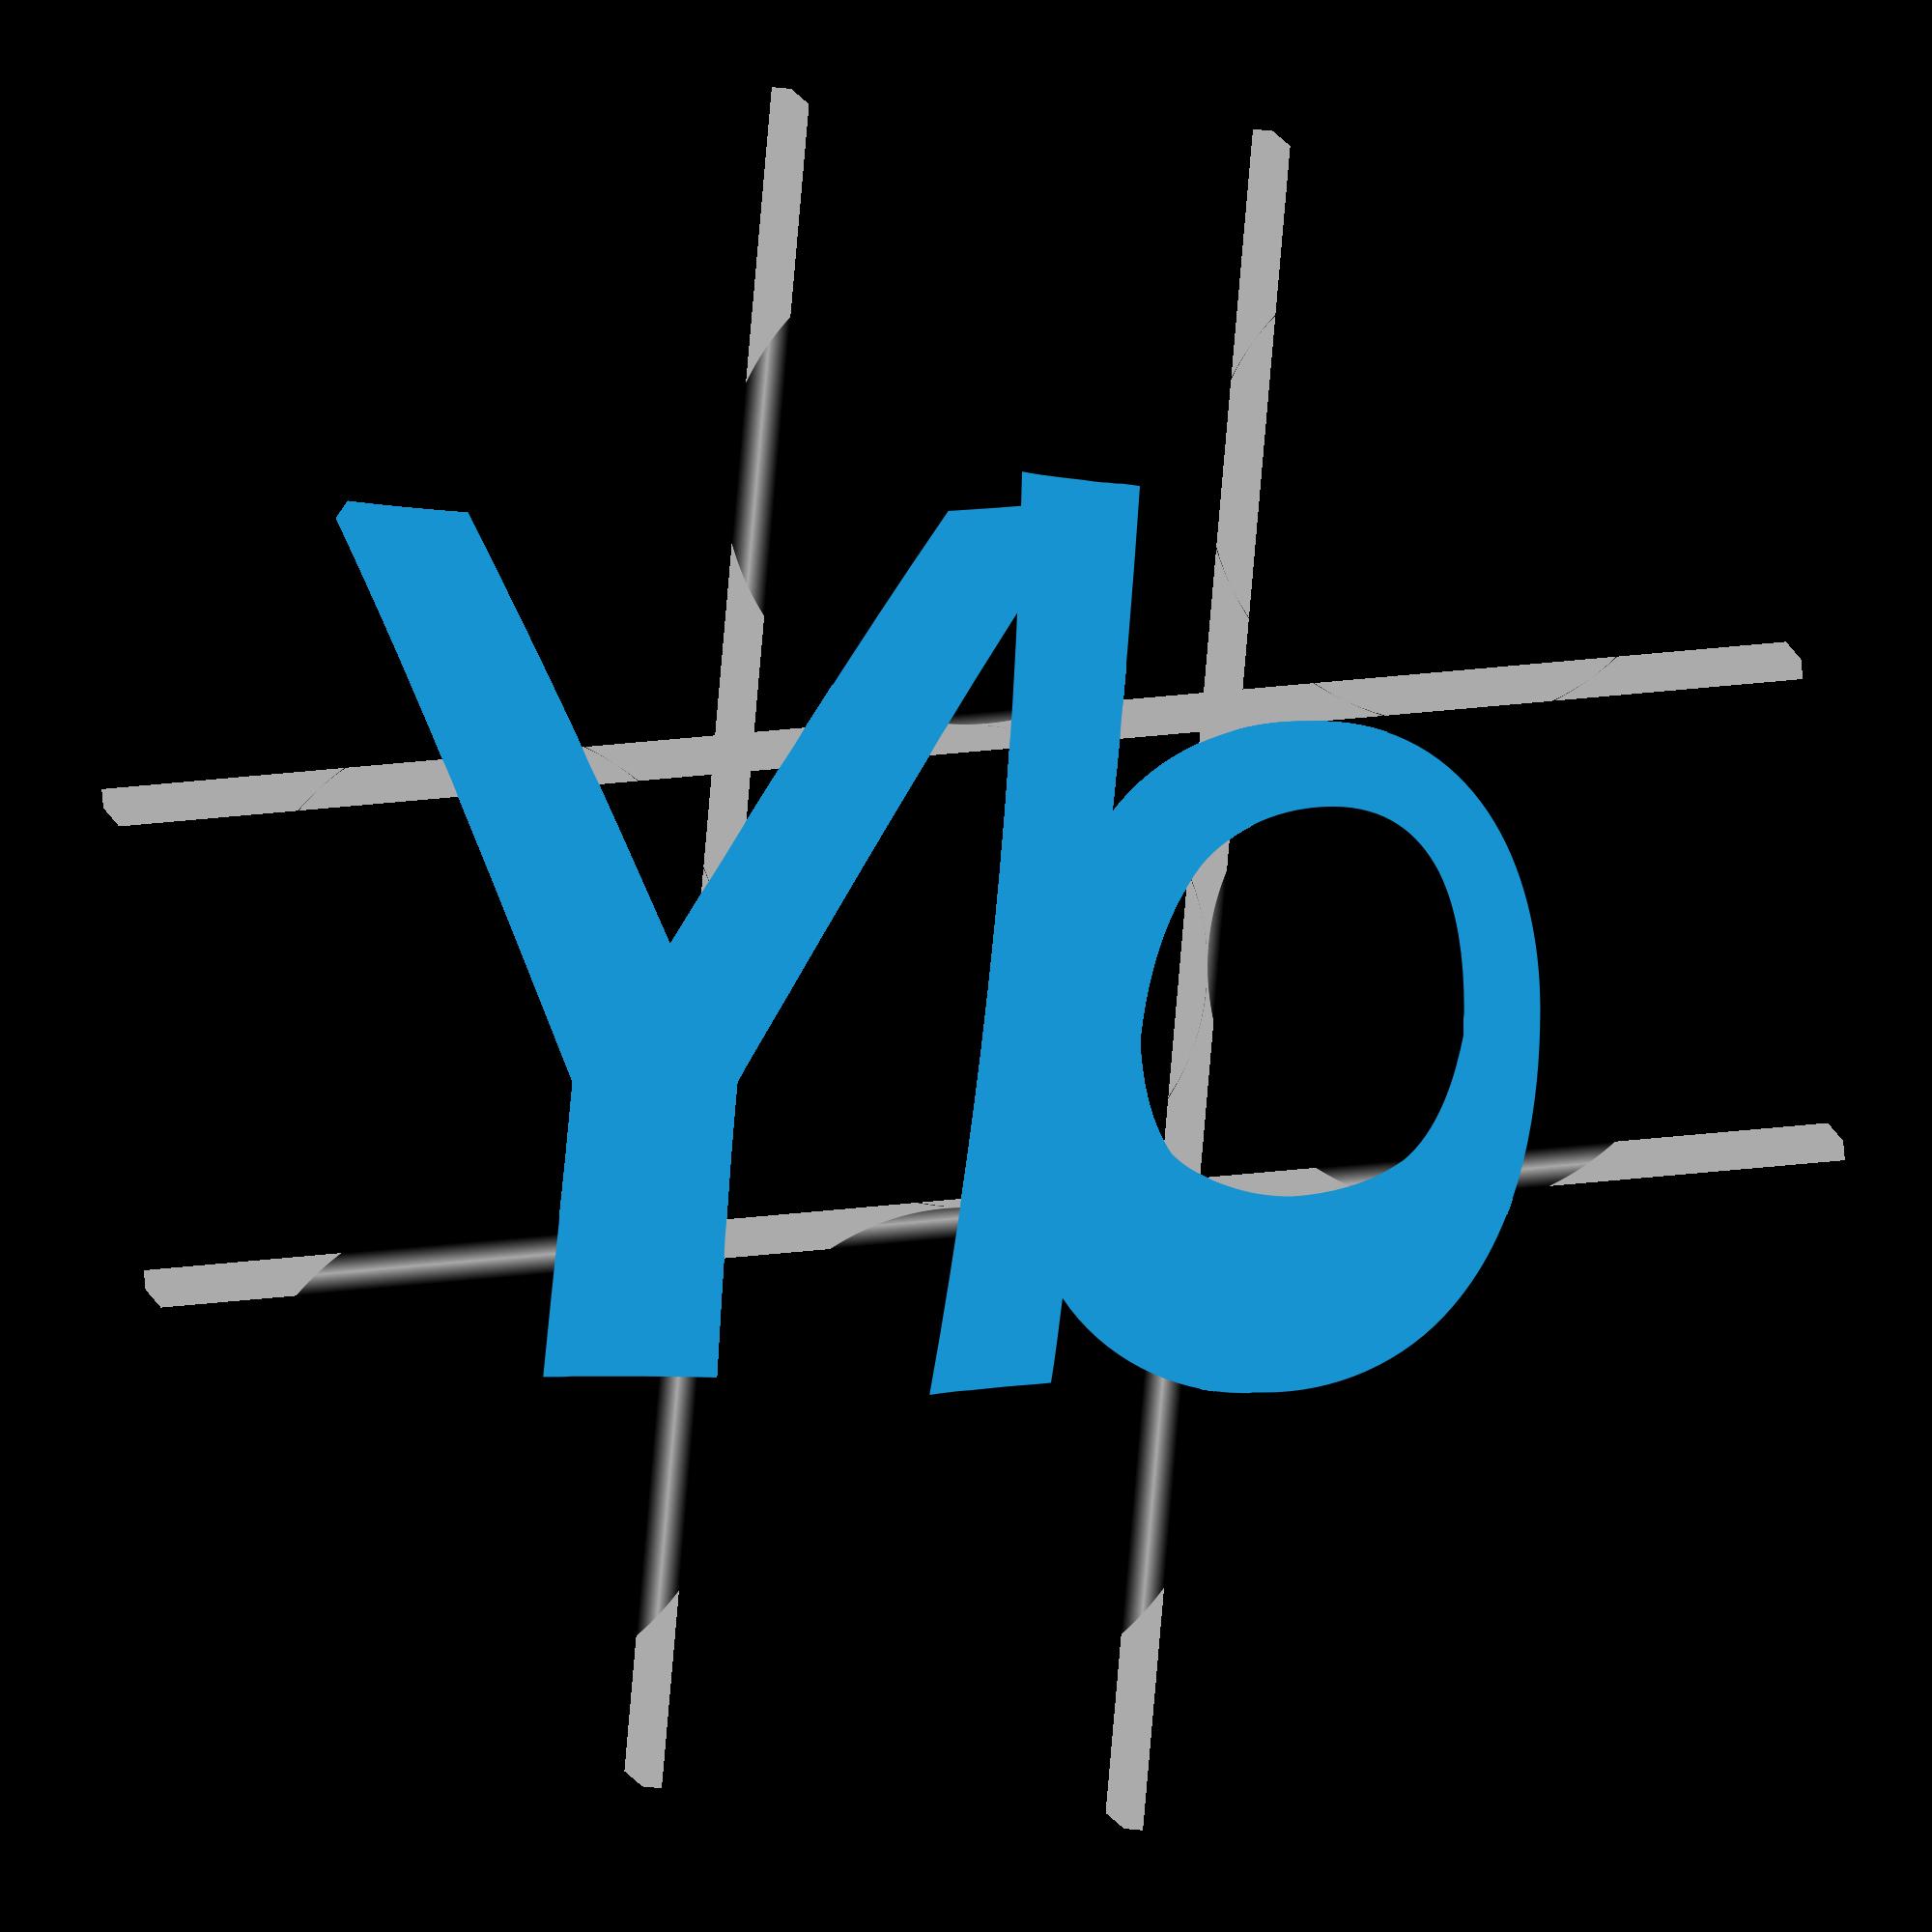 YapBlog